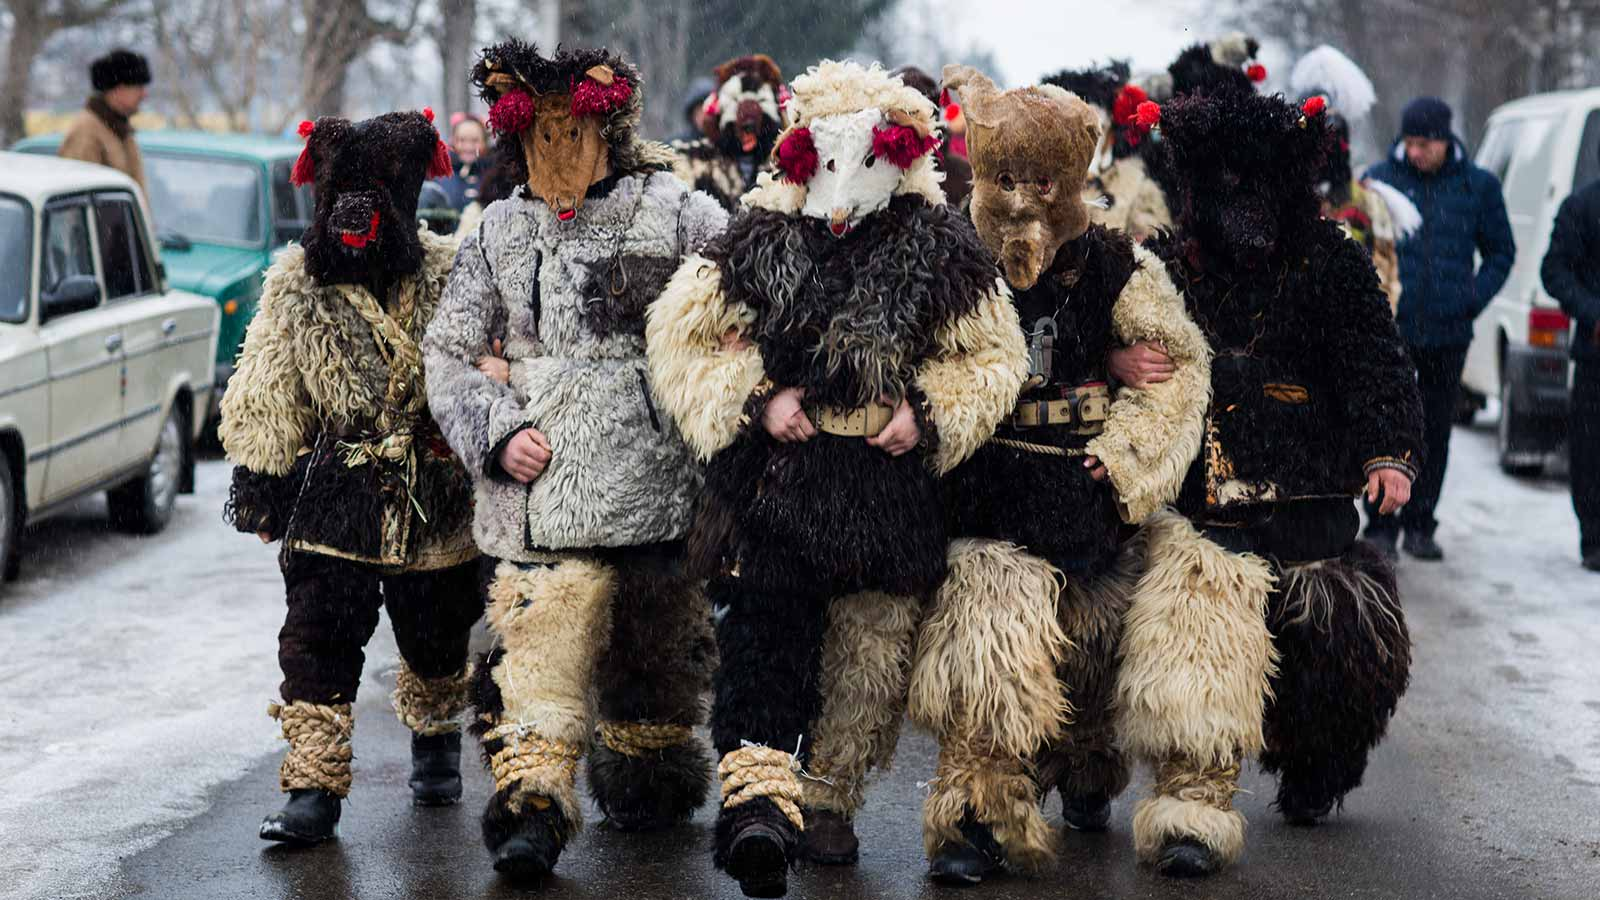 A Malanka festival celebration in the Ukraine.